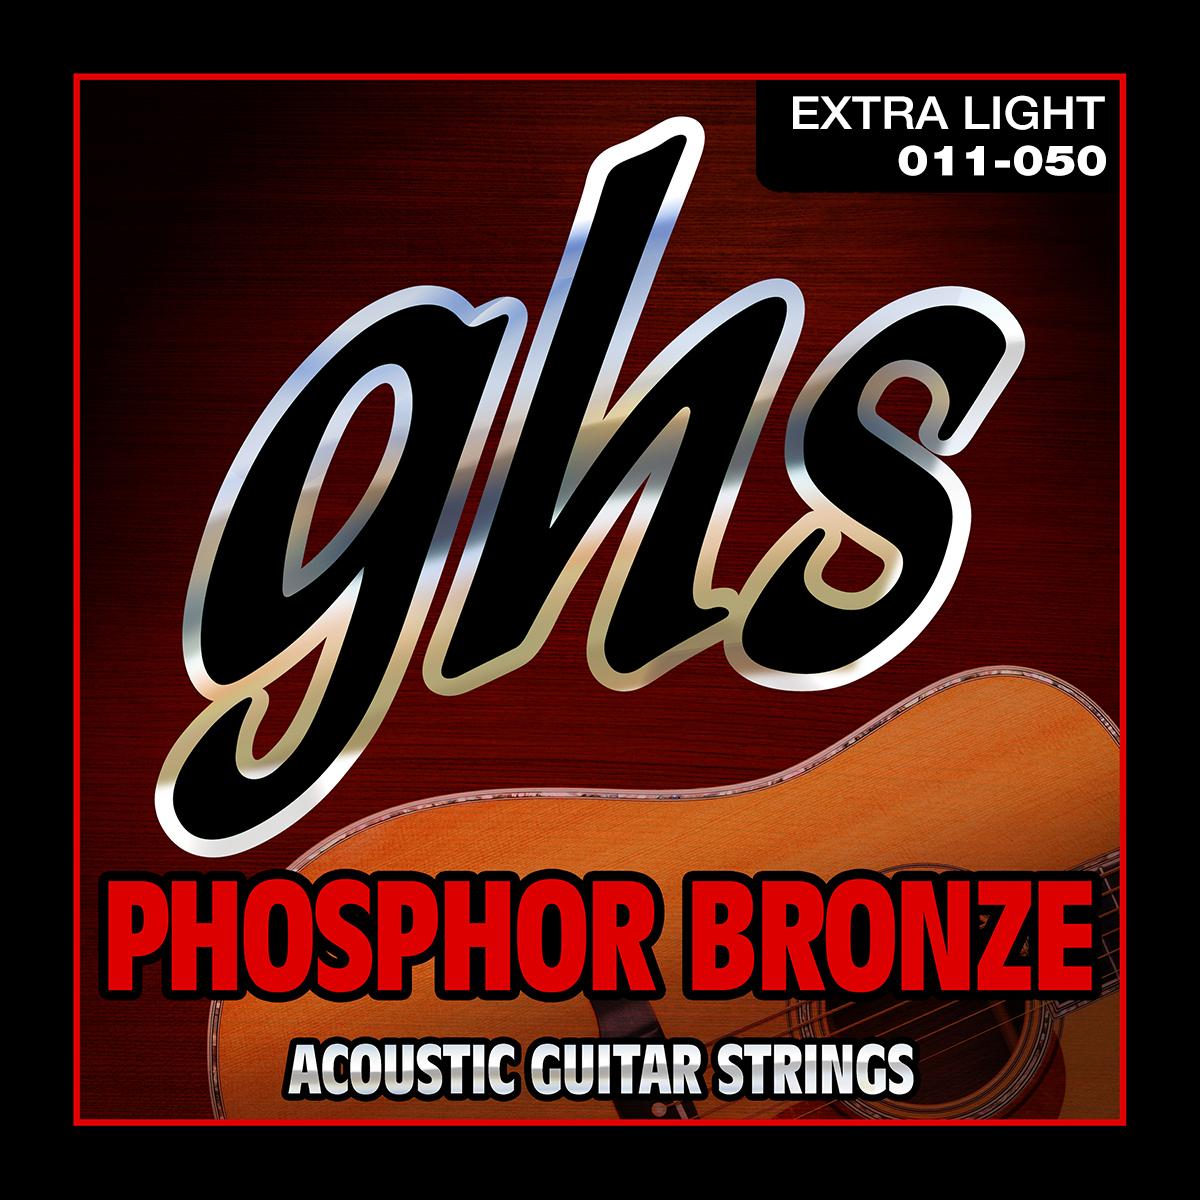 GHS S315/1150 포스포 브론즈 엑스트라 라이트 어쿠스틱 기타 줄, 혼합색상